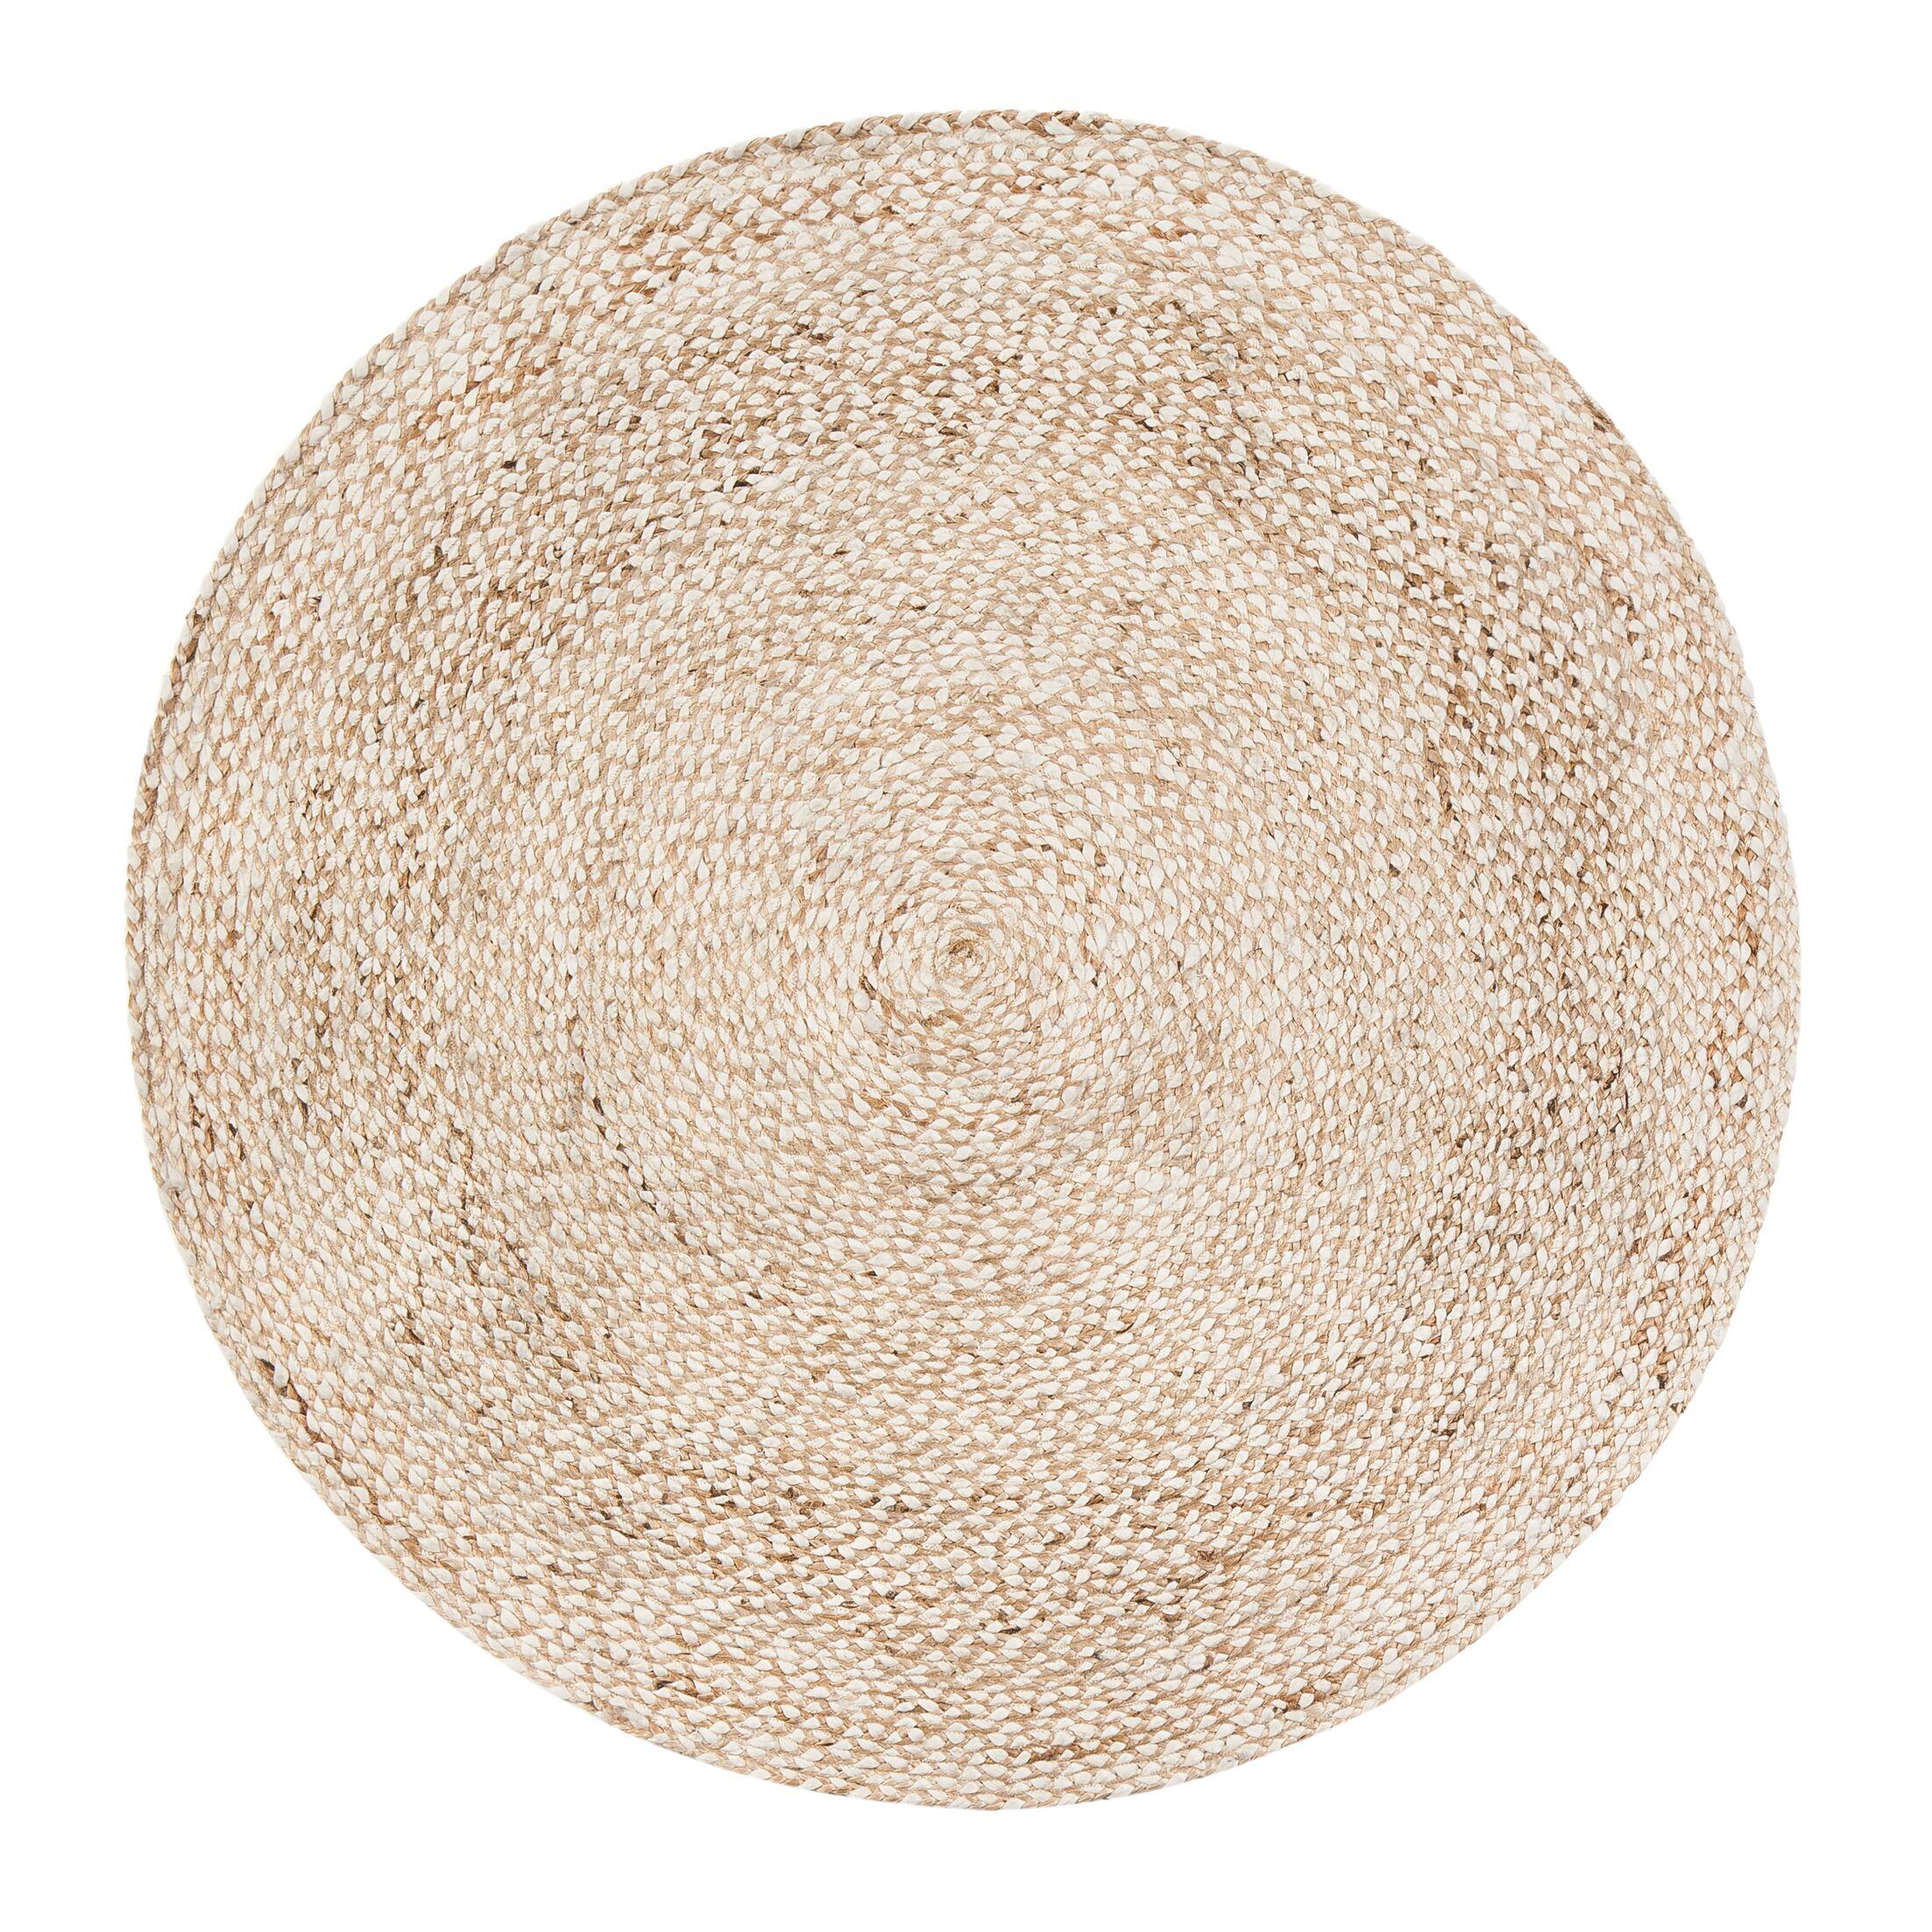 Wilhelmina Handmade Ivory/Tan Area Rug Rug Size: Round 6'